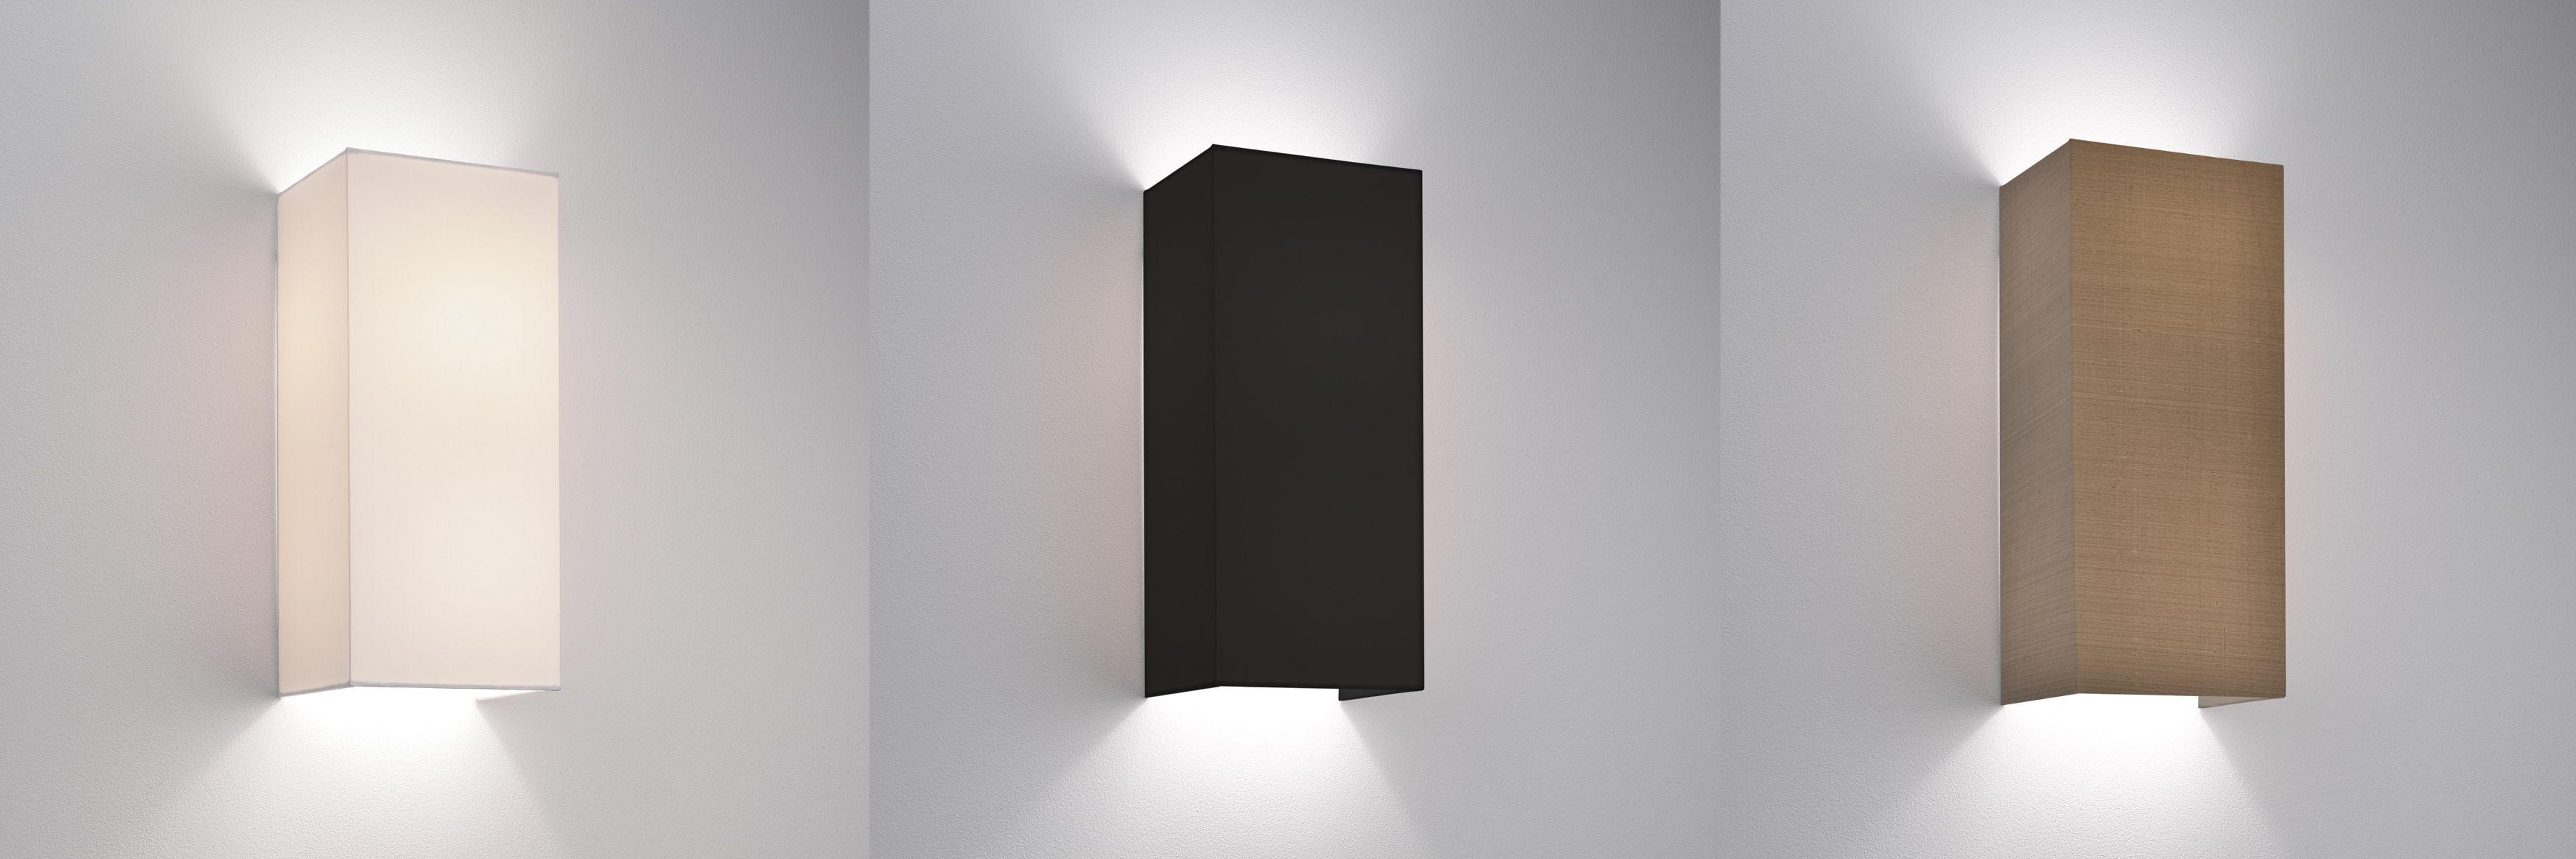 Astro Chuo 380 Fabric Wall Light Shade 2 X 60w E27 White Black Oyster